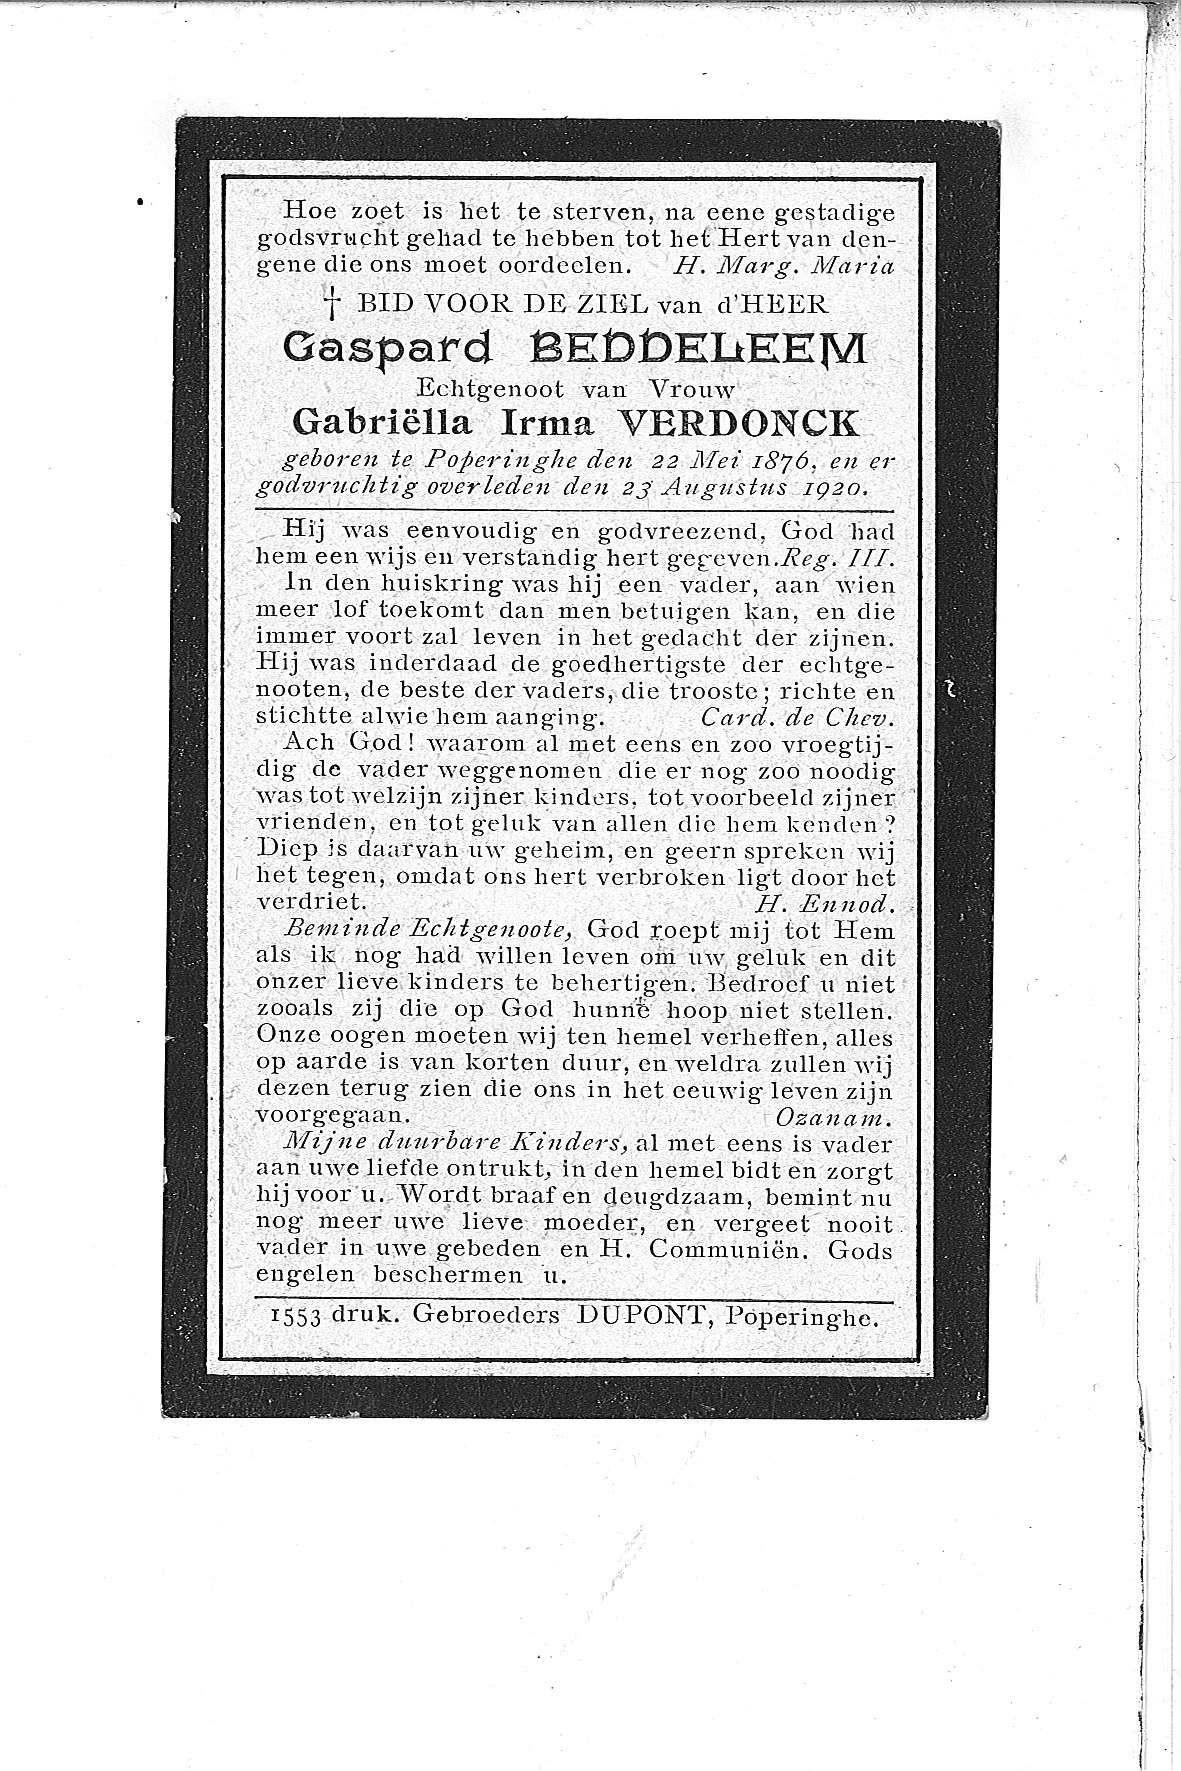 Gaspard(1920)20101125100742_00009.jpg